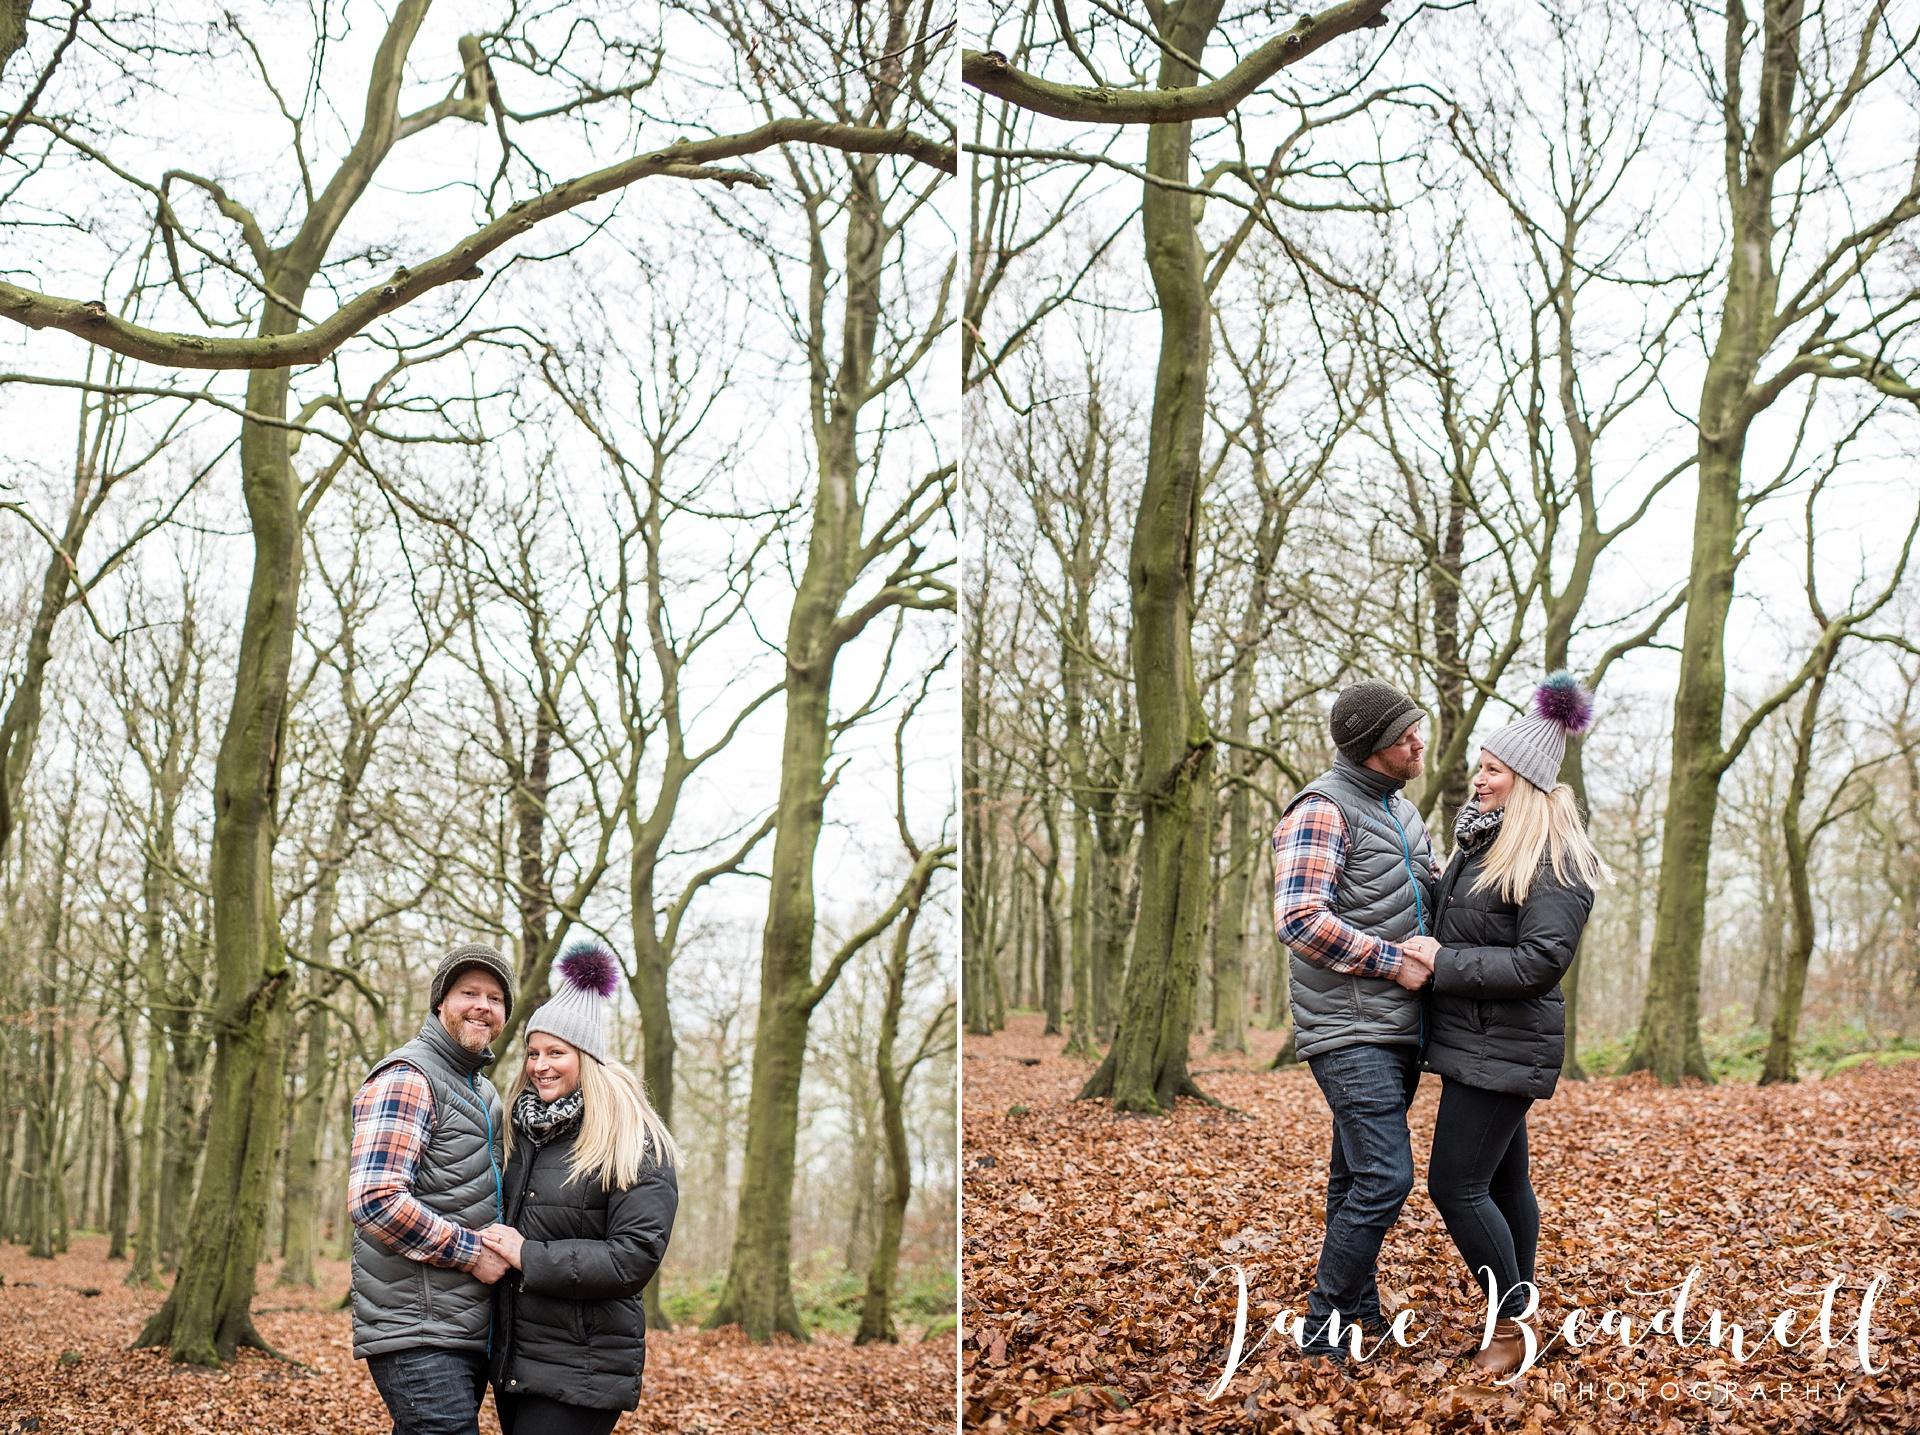 yorkshire-wedding-photographer-jane-beadnell-photography-uk-and-destination-wedding-photographer-engagement-shoot_0041